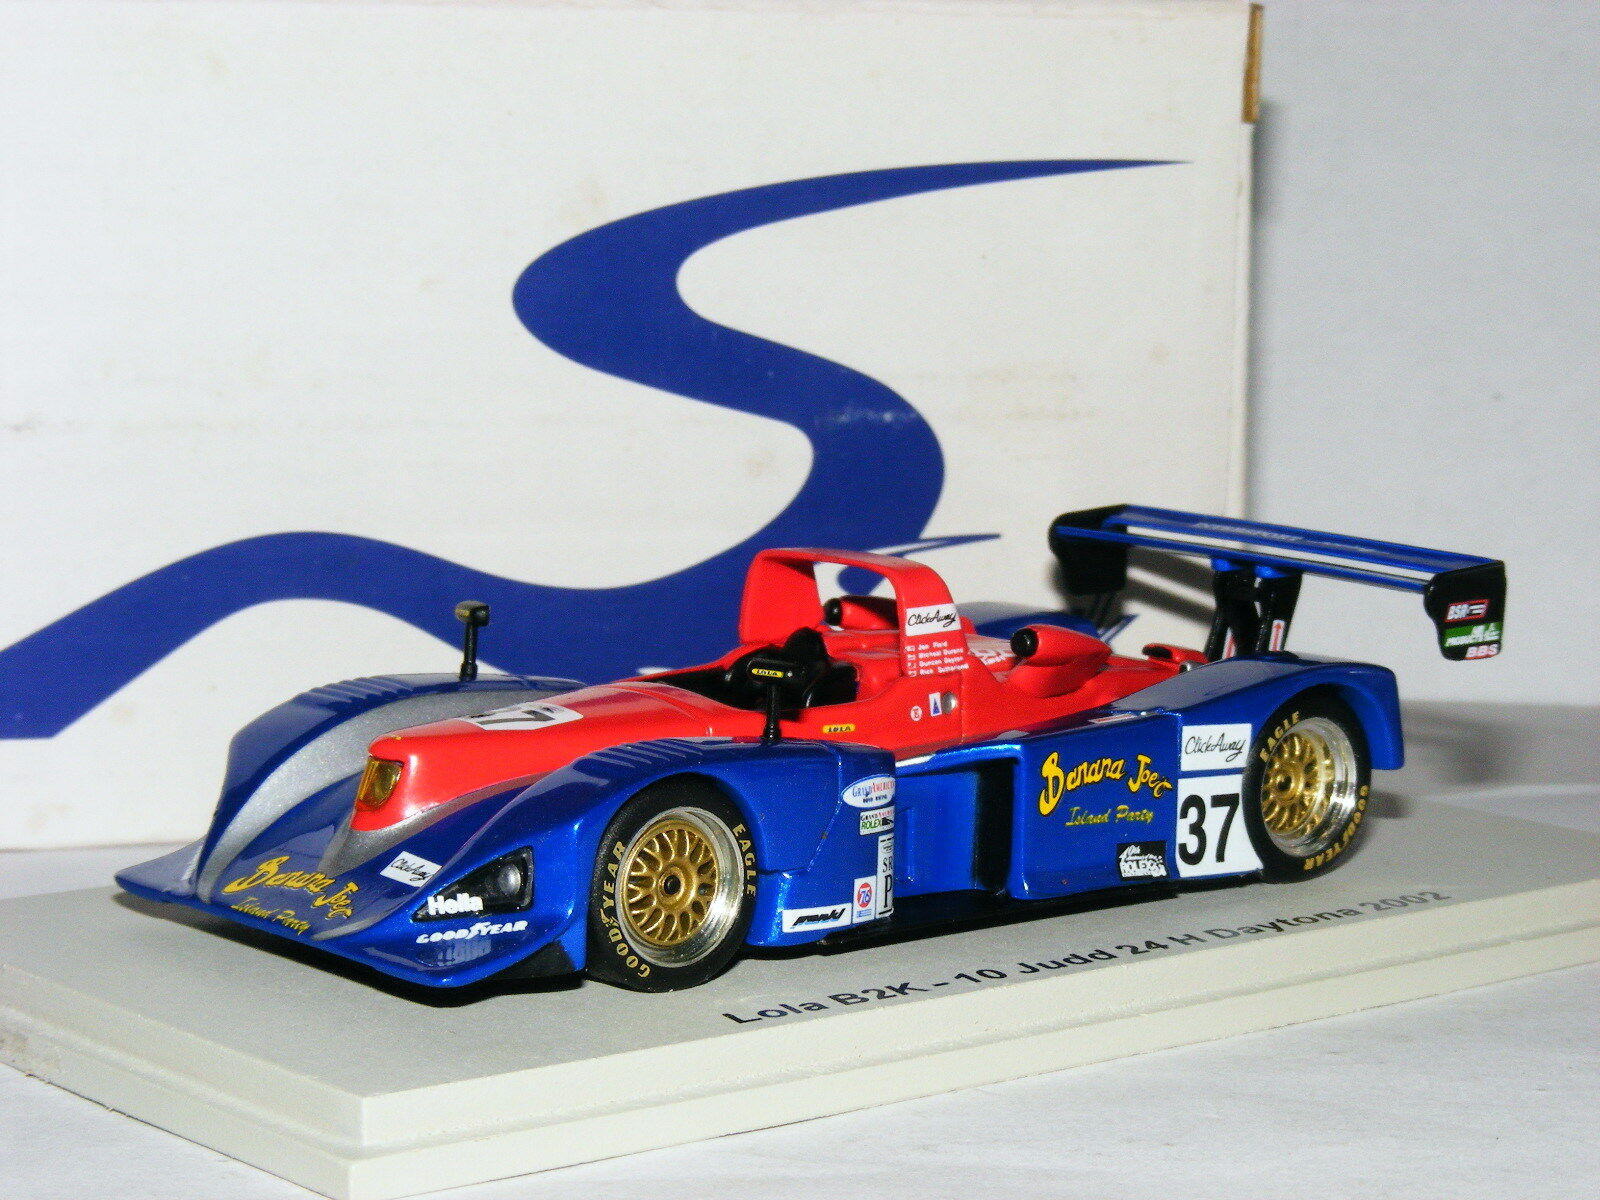 Spark Scla 08 Lola B2K 10 10 10 Judd tienda Intersport Racing 2002 Daytona 24hrs  37 1 43 4e8818